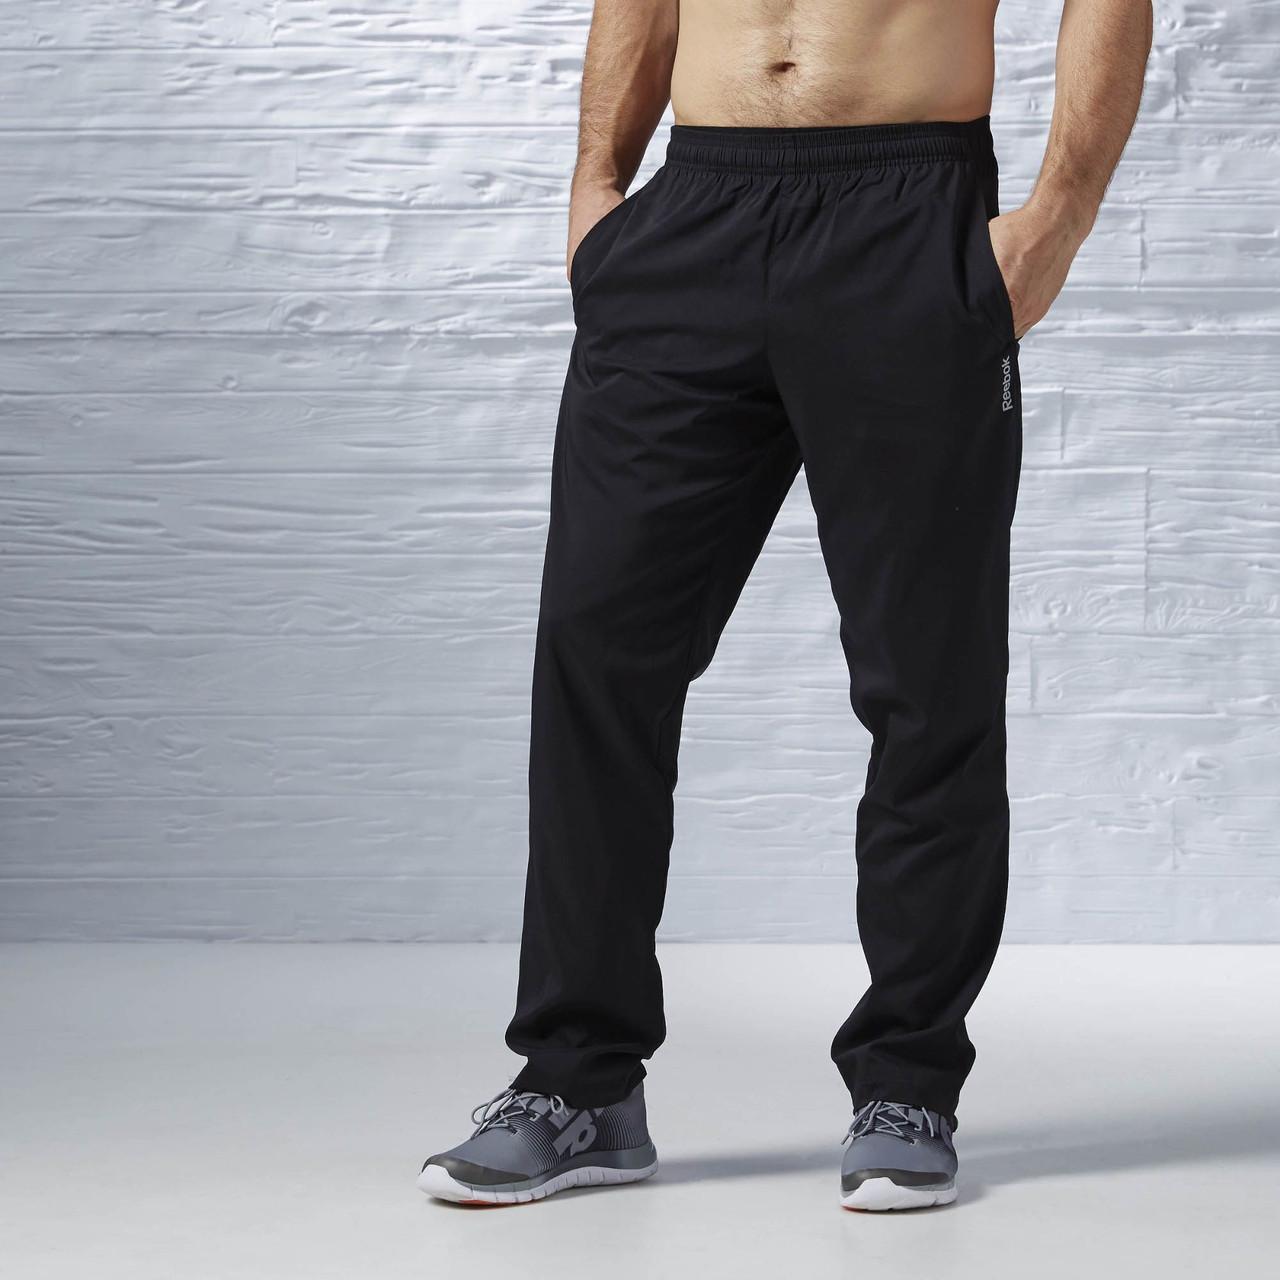 Мужские брюки Reebok Elements Woven Pant (Артикул: AJ3058)